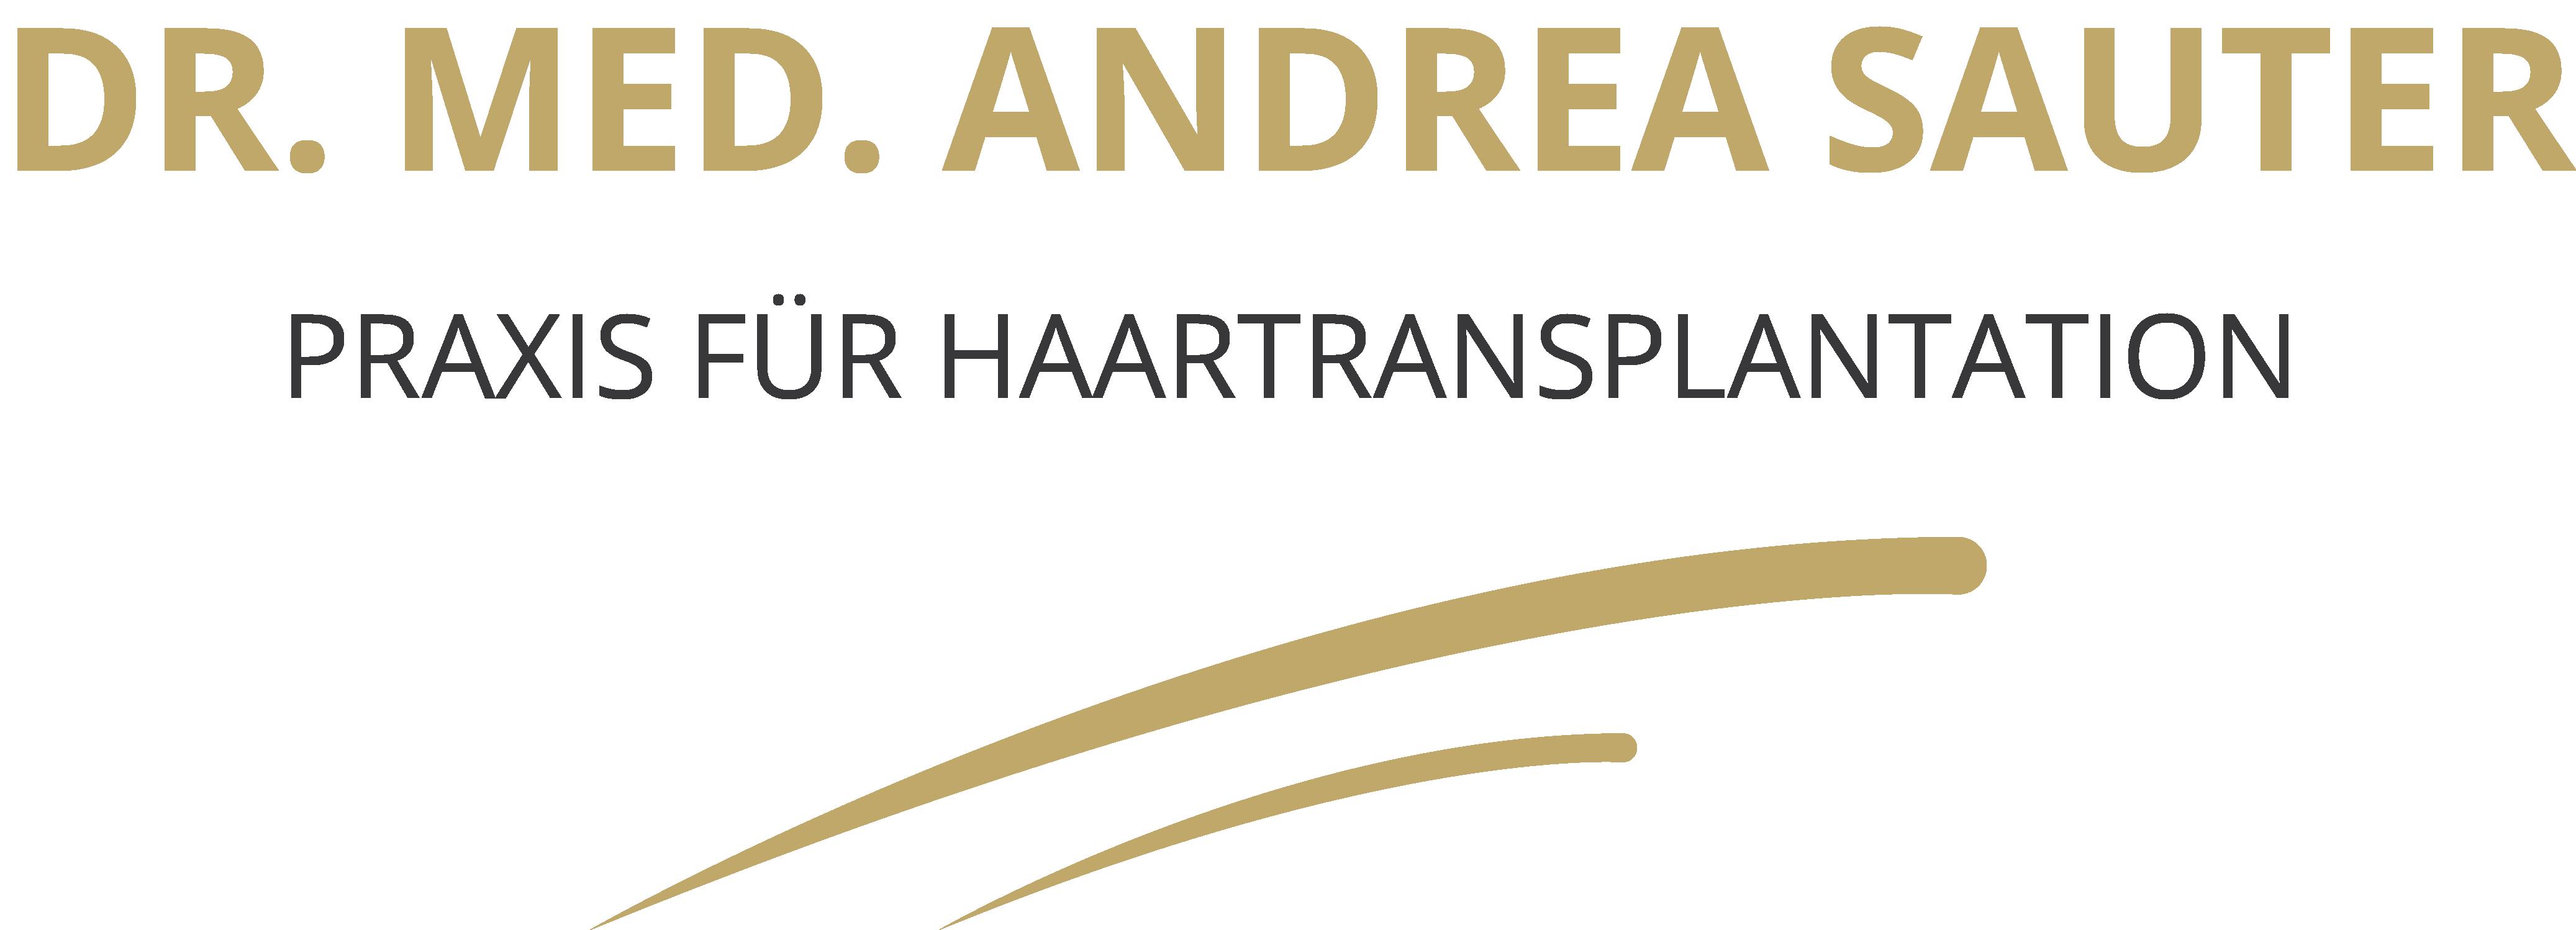 Haartransplantation in der Praxis Dr. med. Andrea Sauter